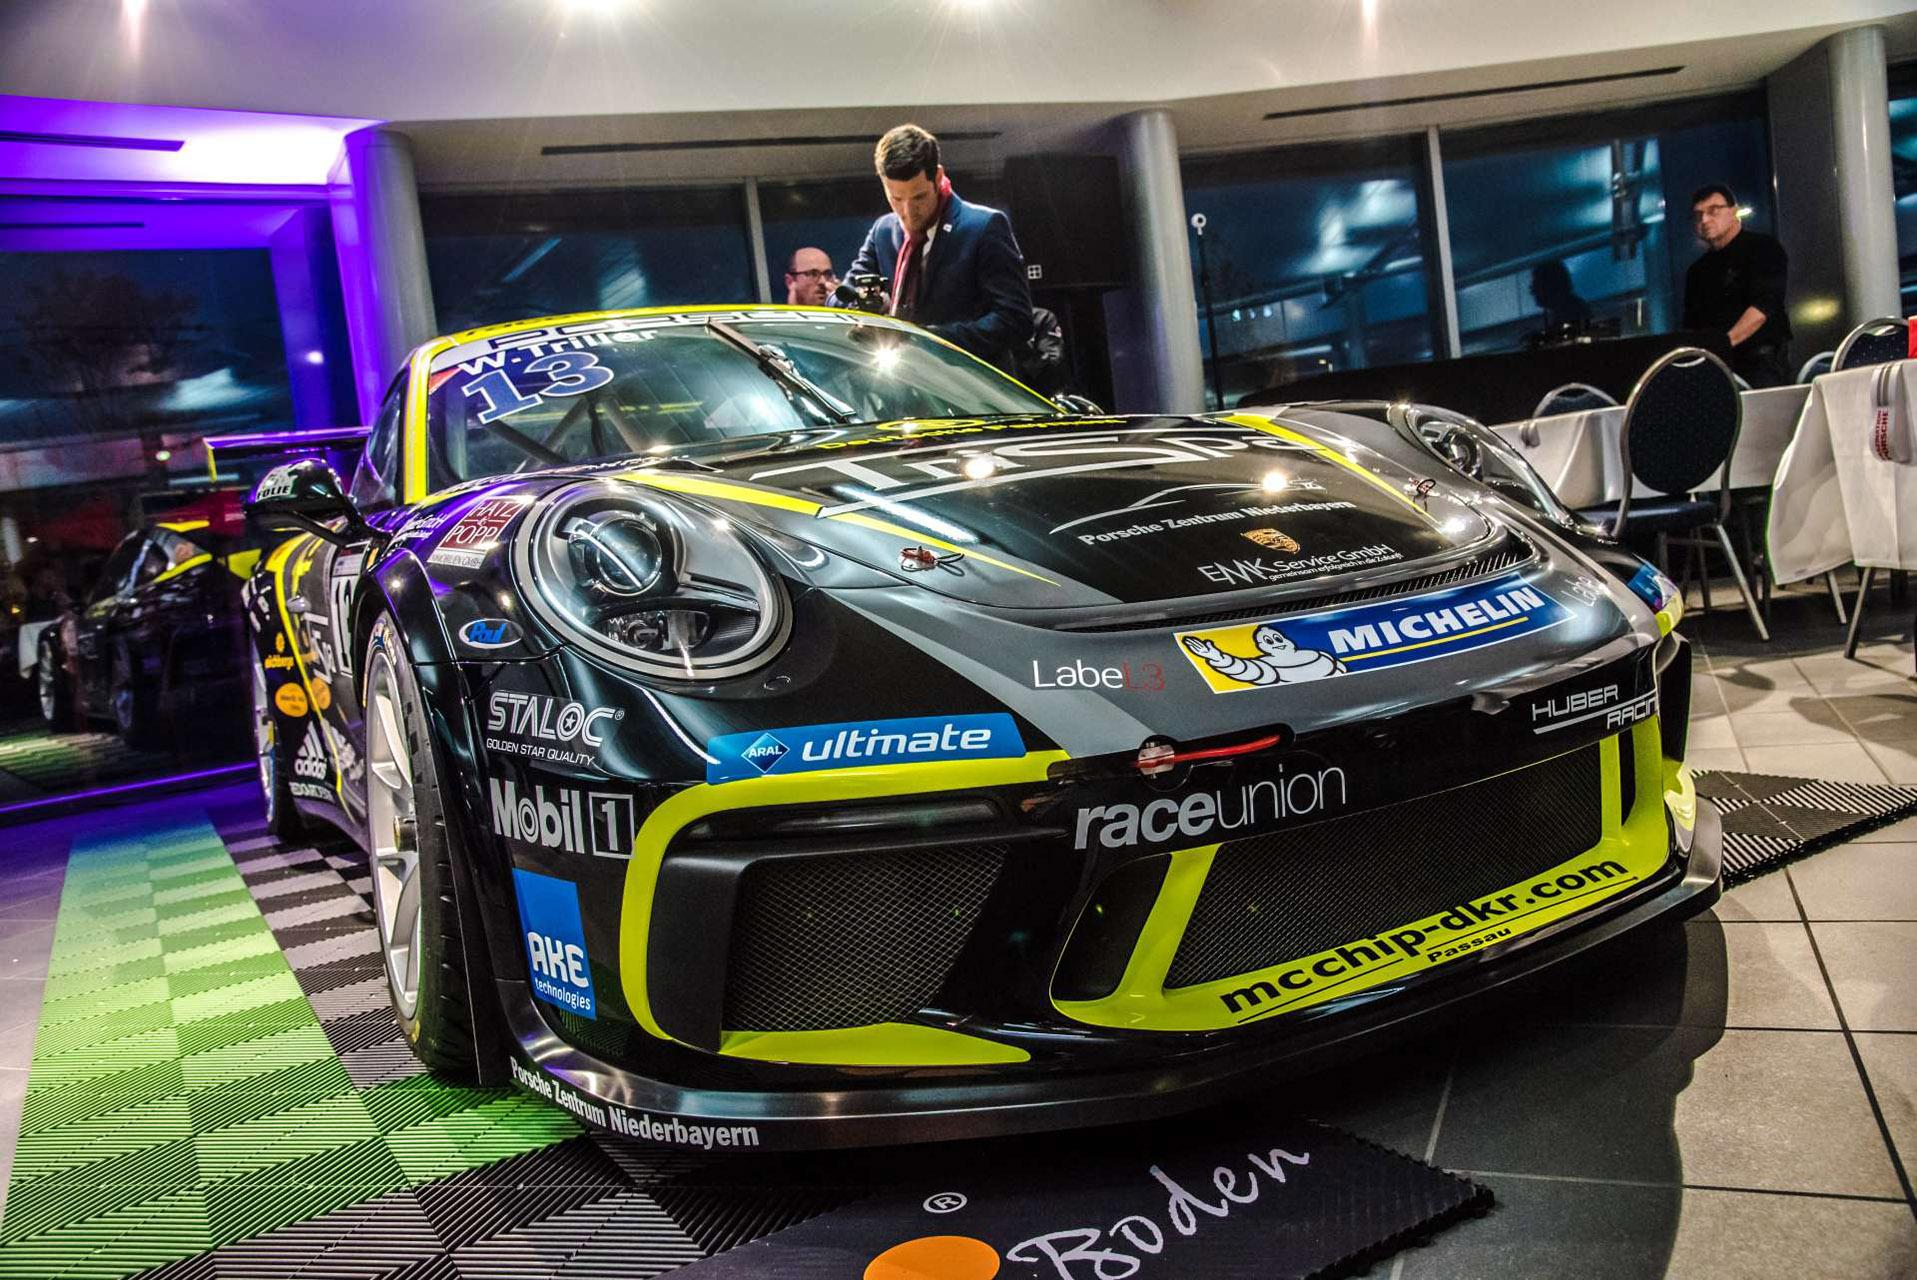 mcchip-dkr ist neuer Partner des Porsche Carrera Cup Teams Huber Racing